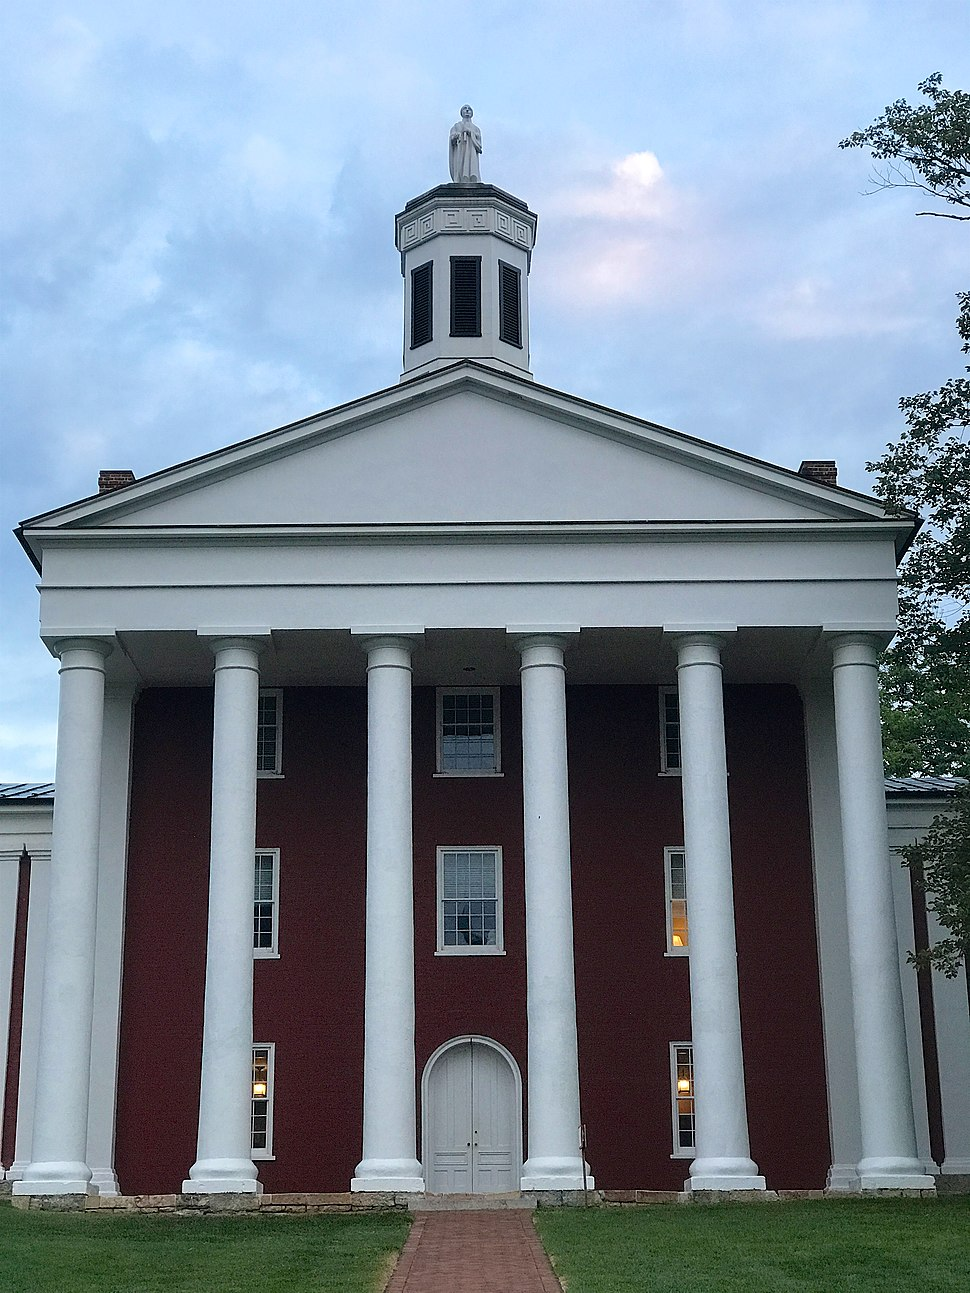 Washington Hall, Washington and Lee University, Lexington, VA